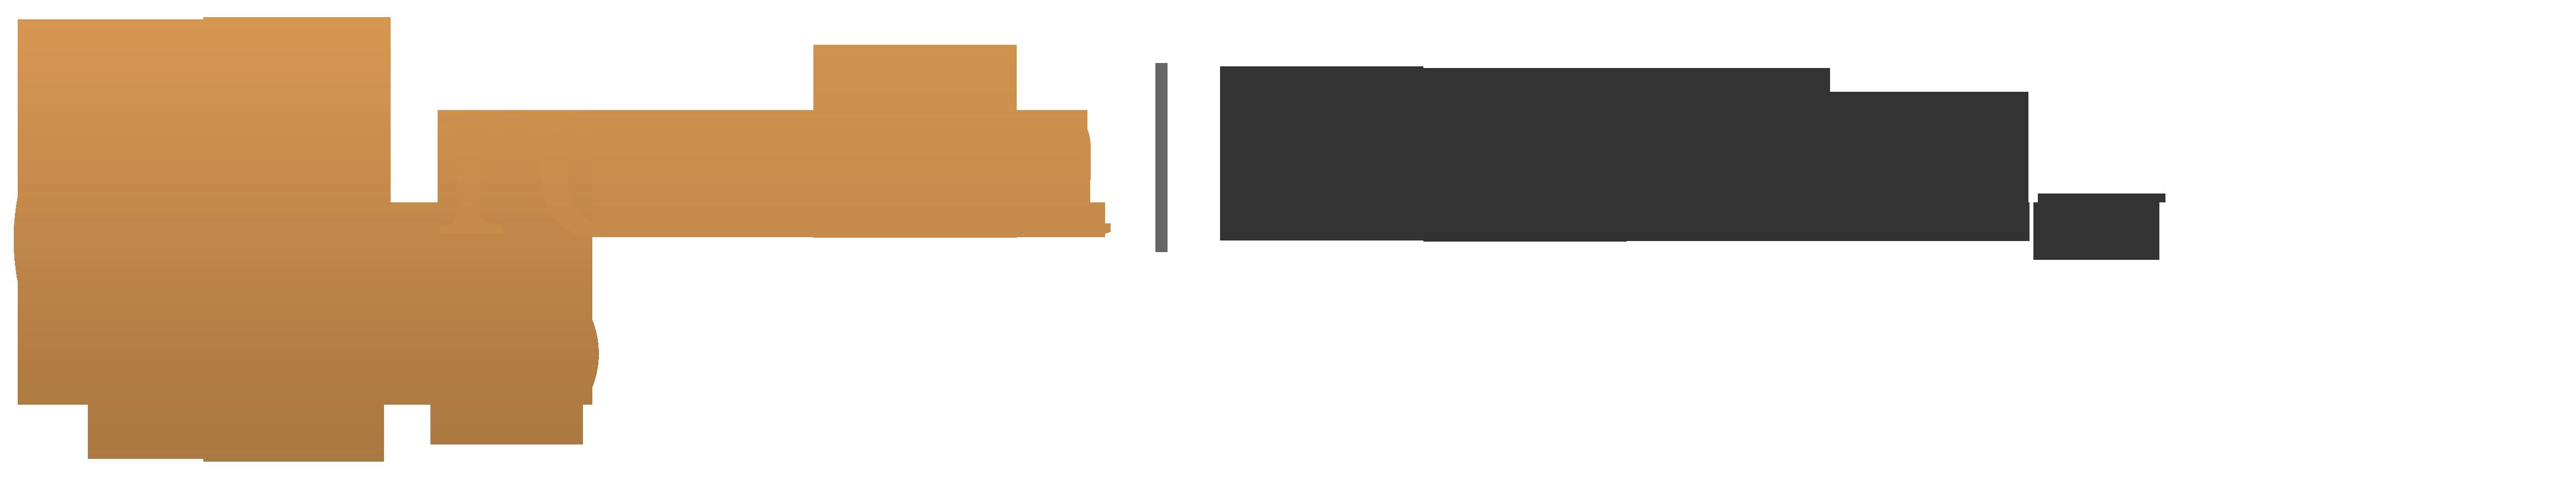 Arcadia: Explorations in Environmental History